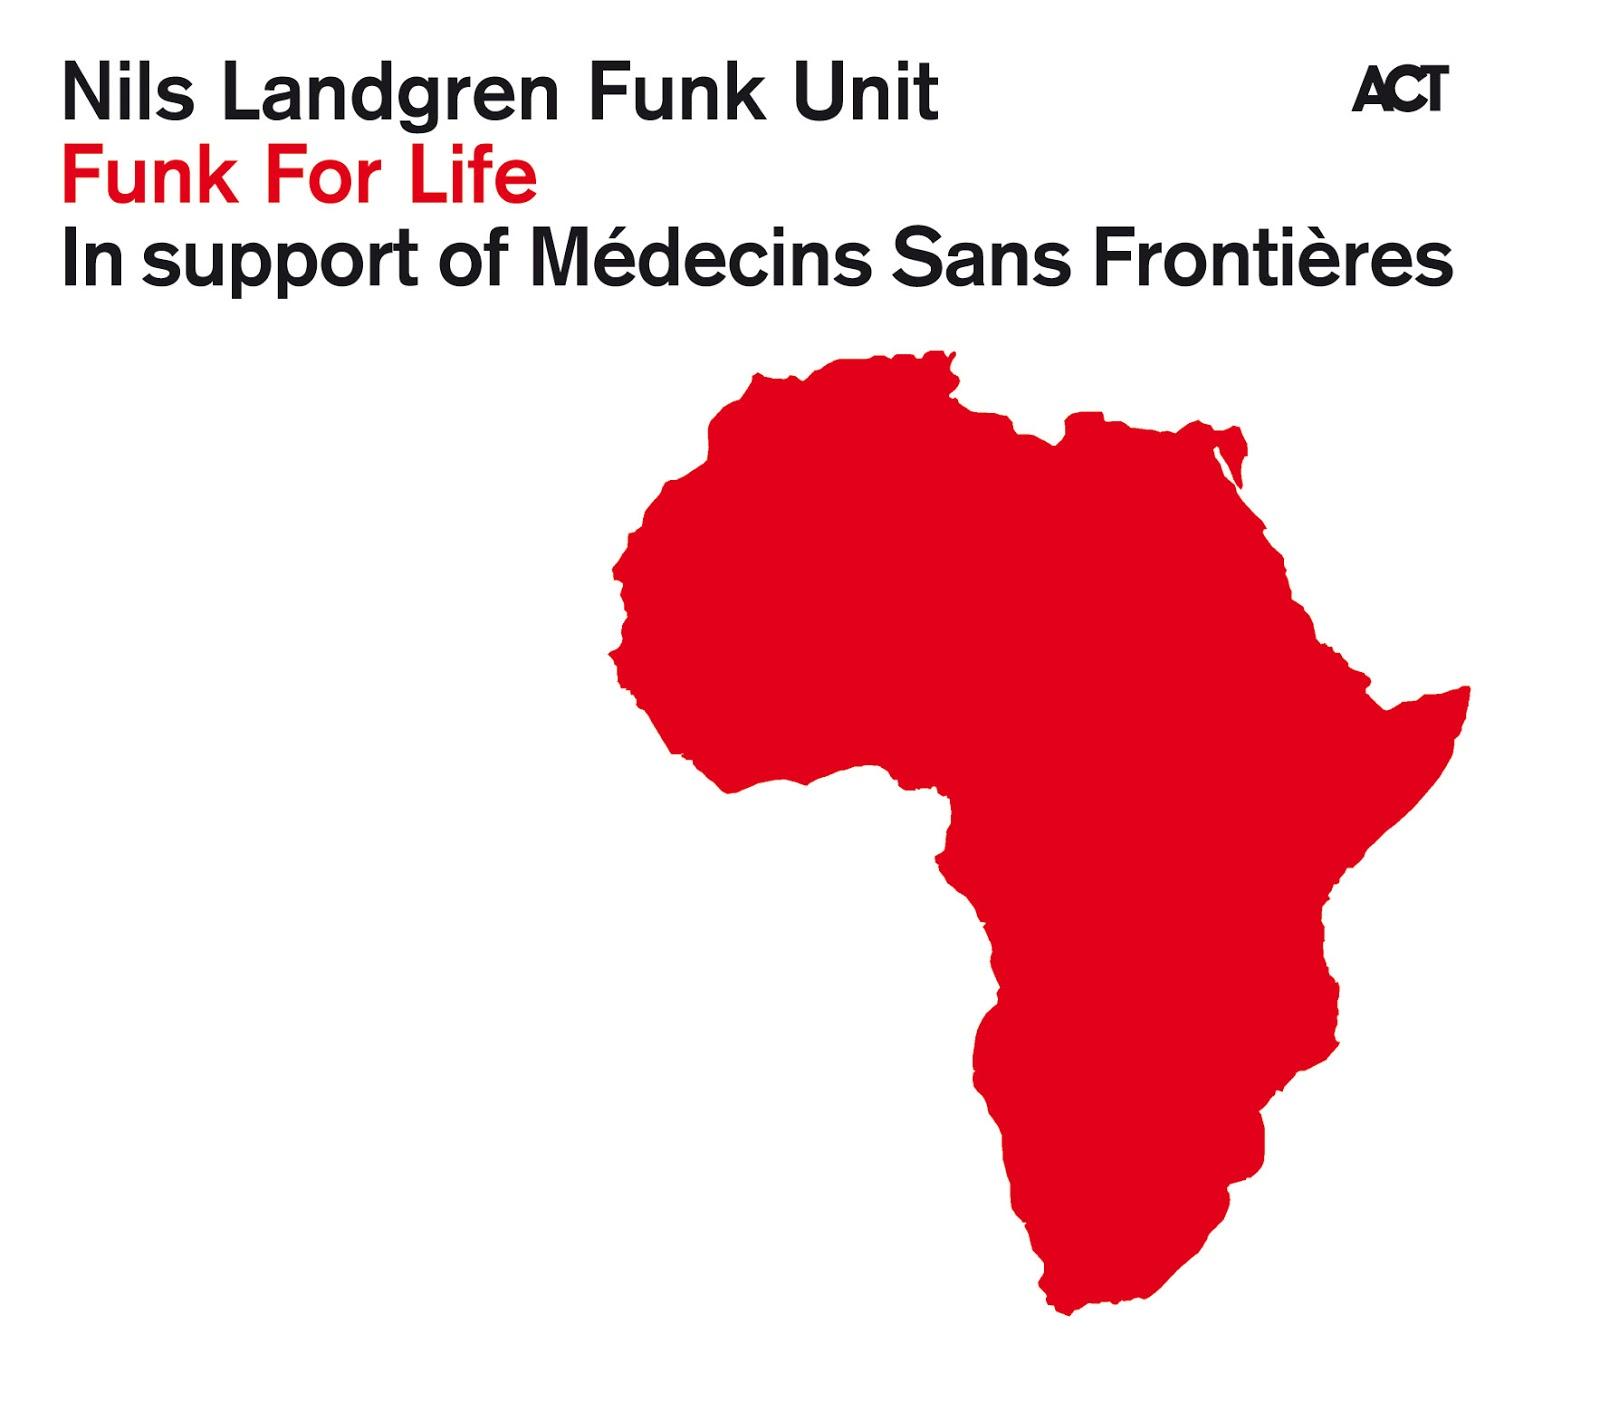 Nils Landgren Funk Unit</br>Funk For Life</br>ACT, 2016